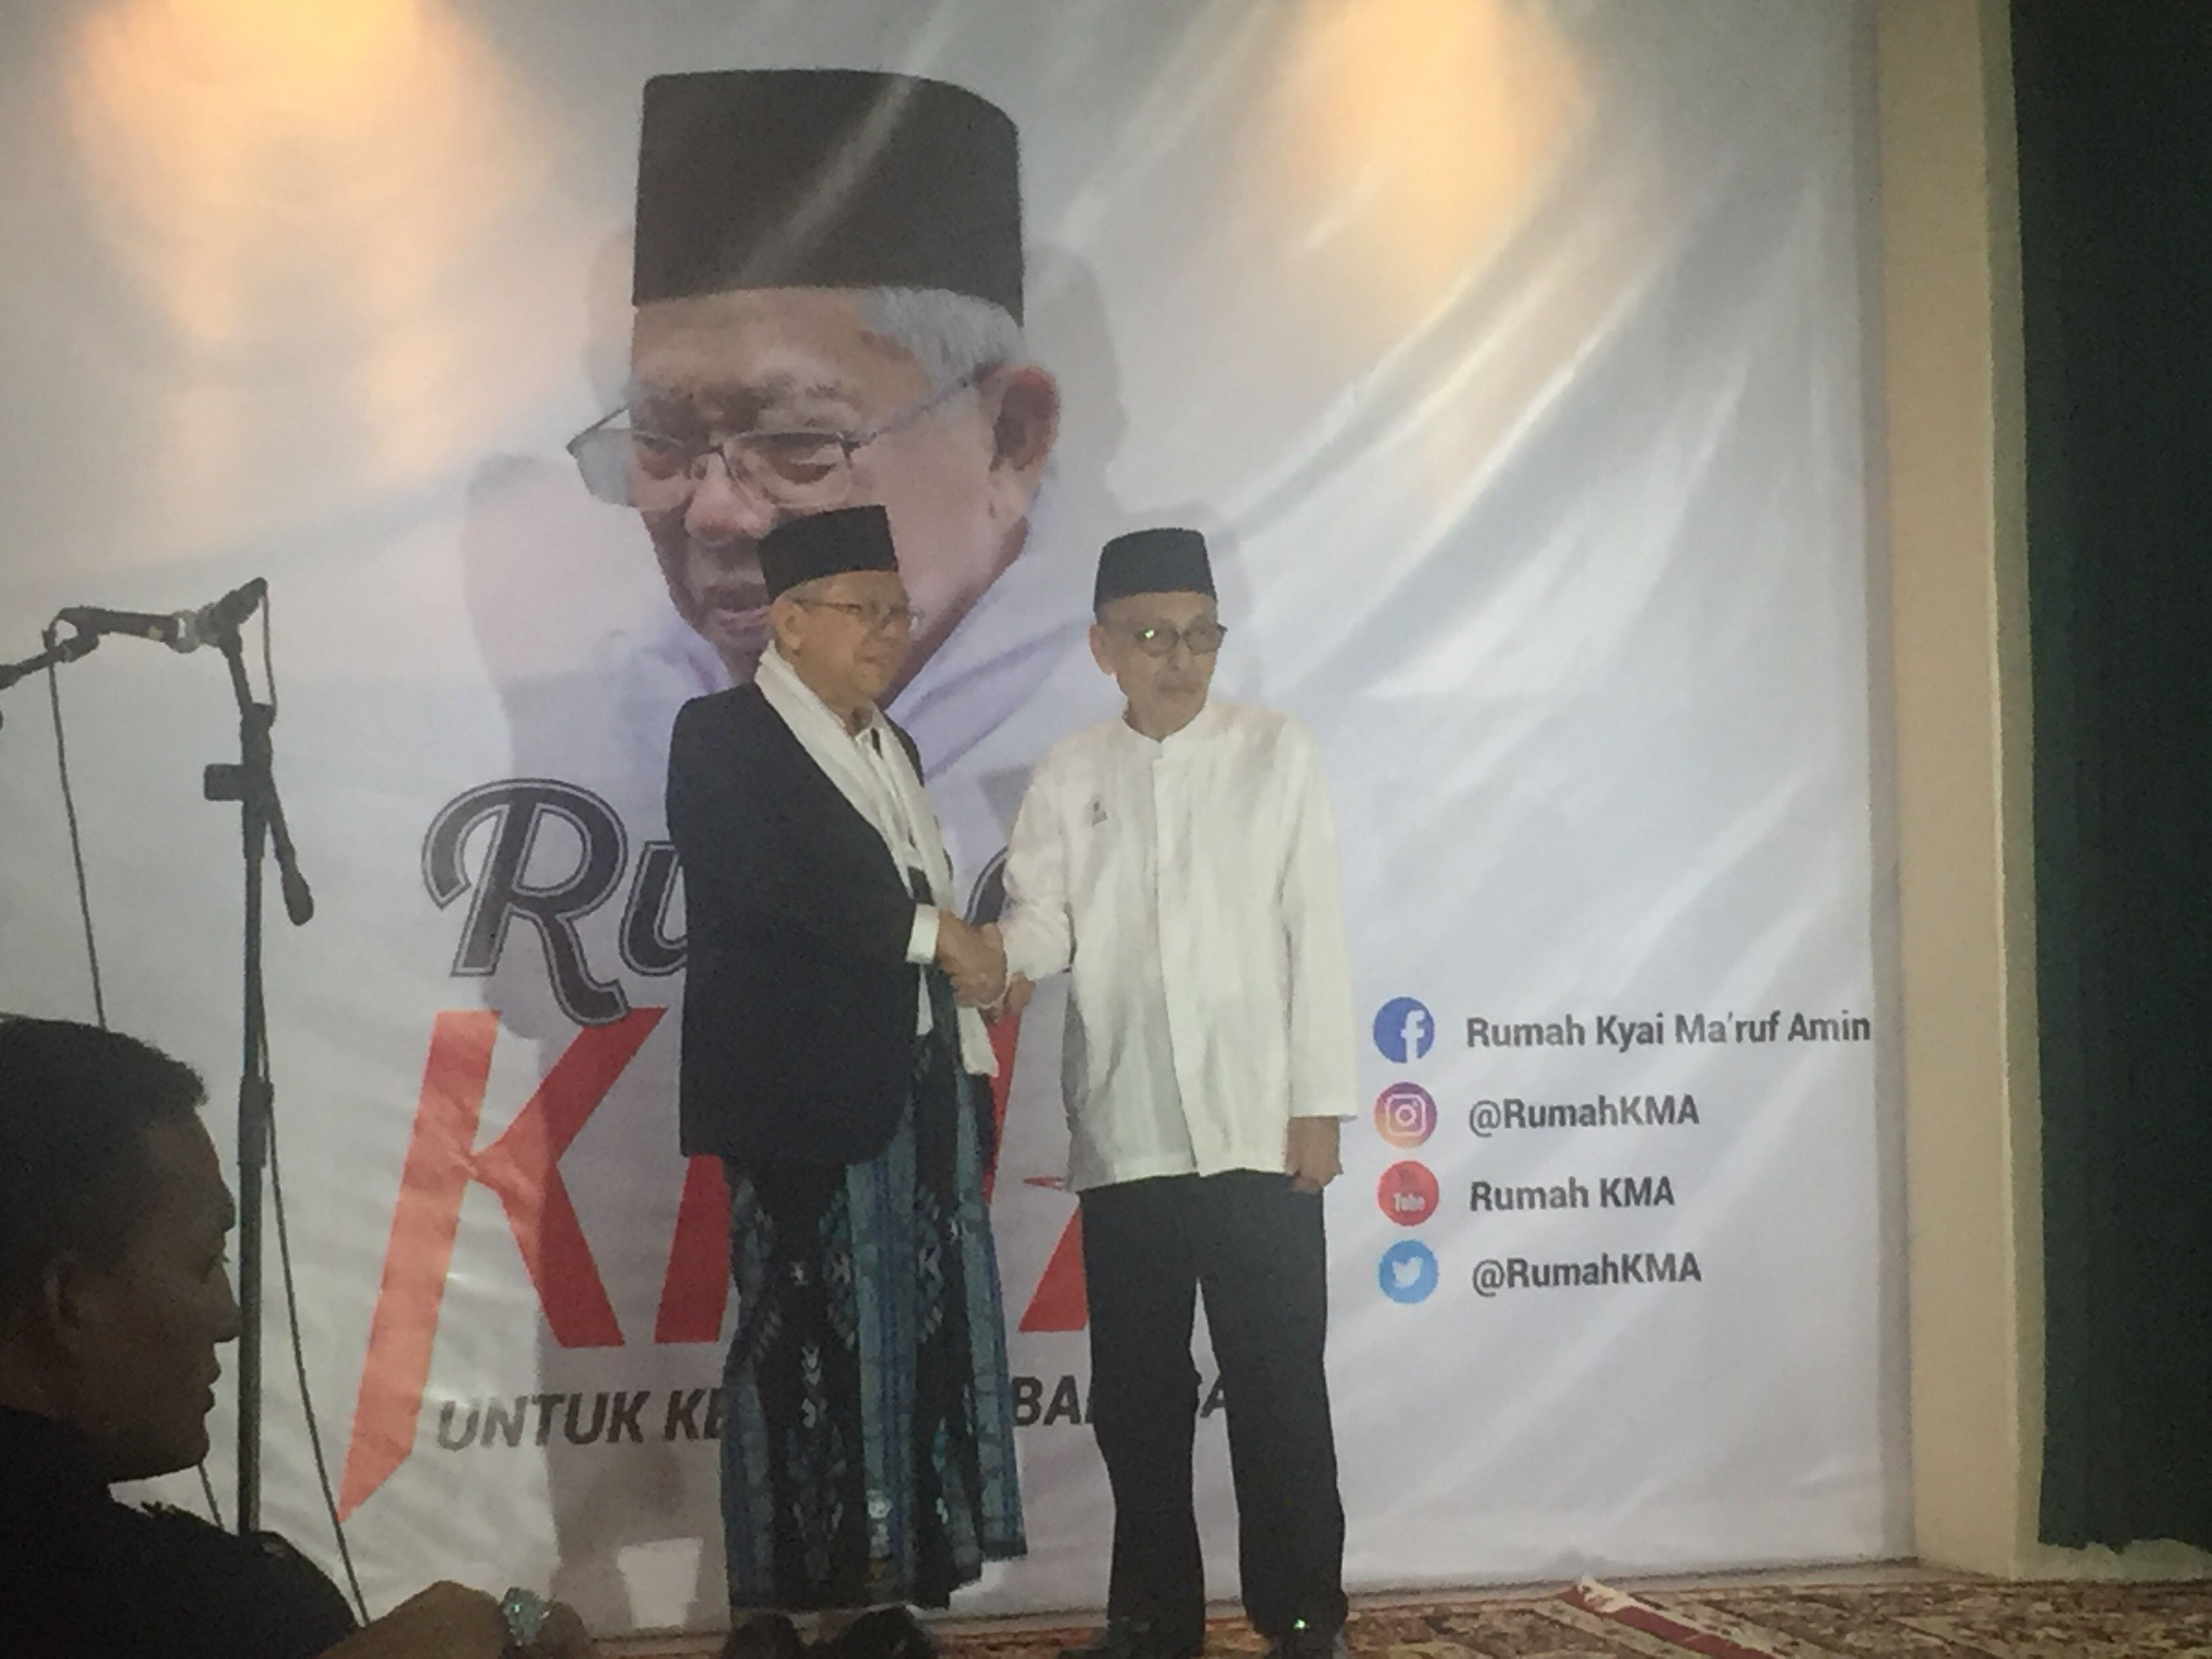 Ma'ruf Amin resmikan Rumah KMA